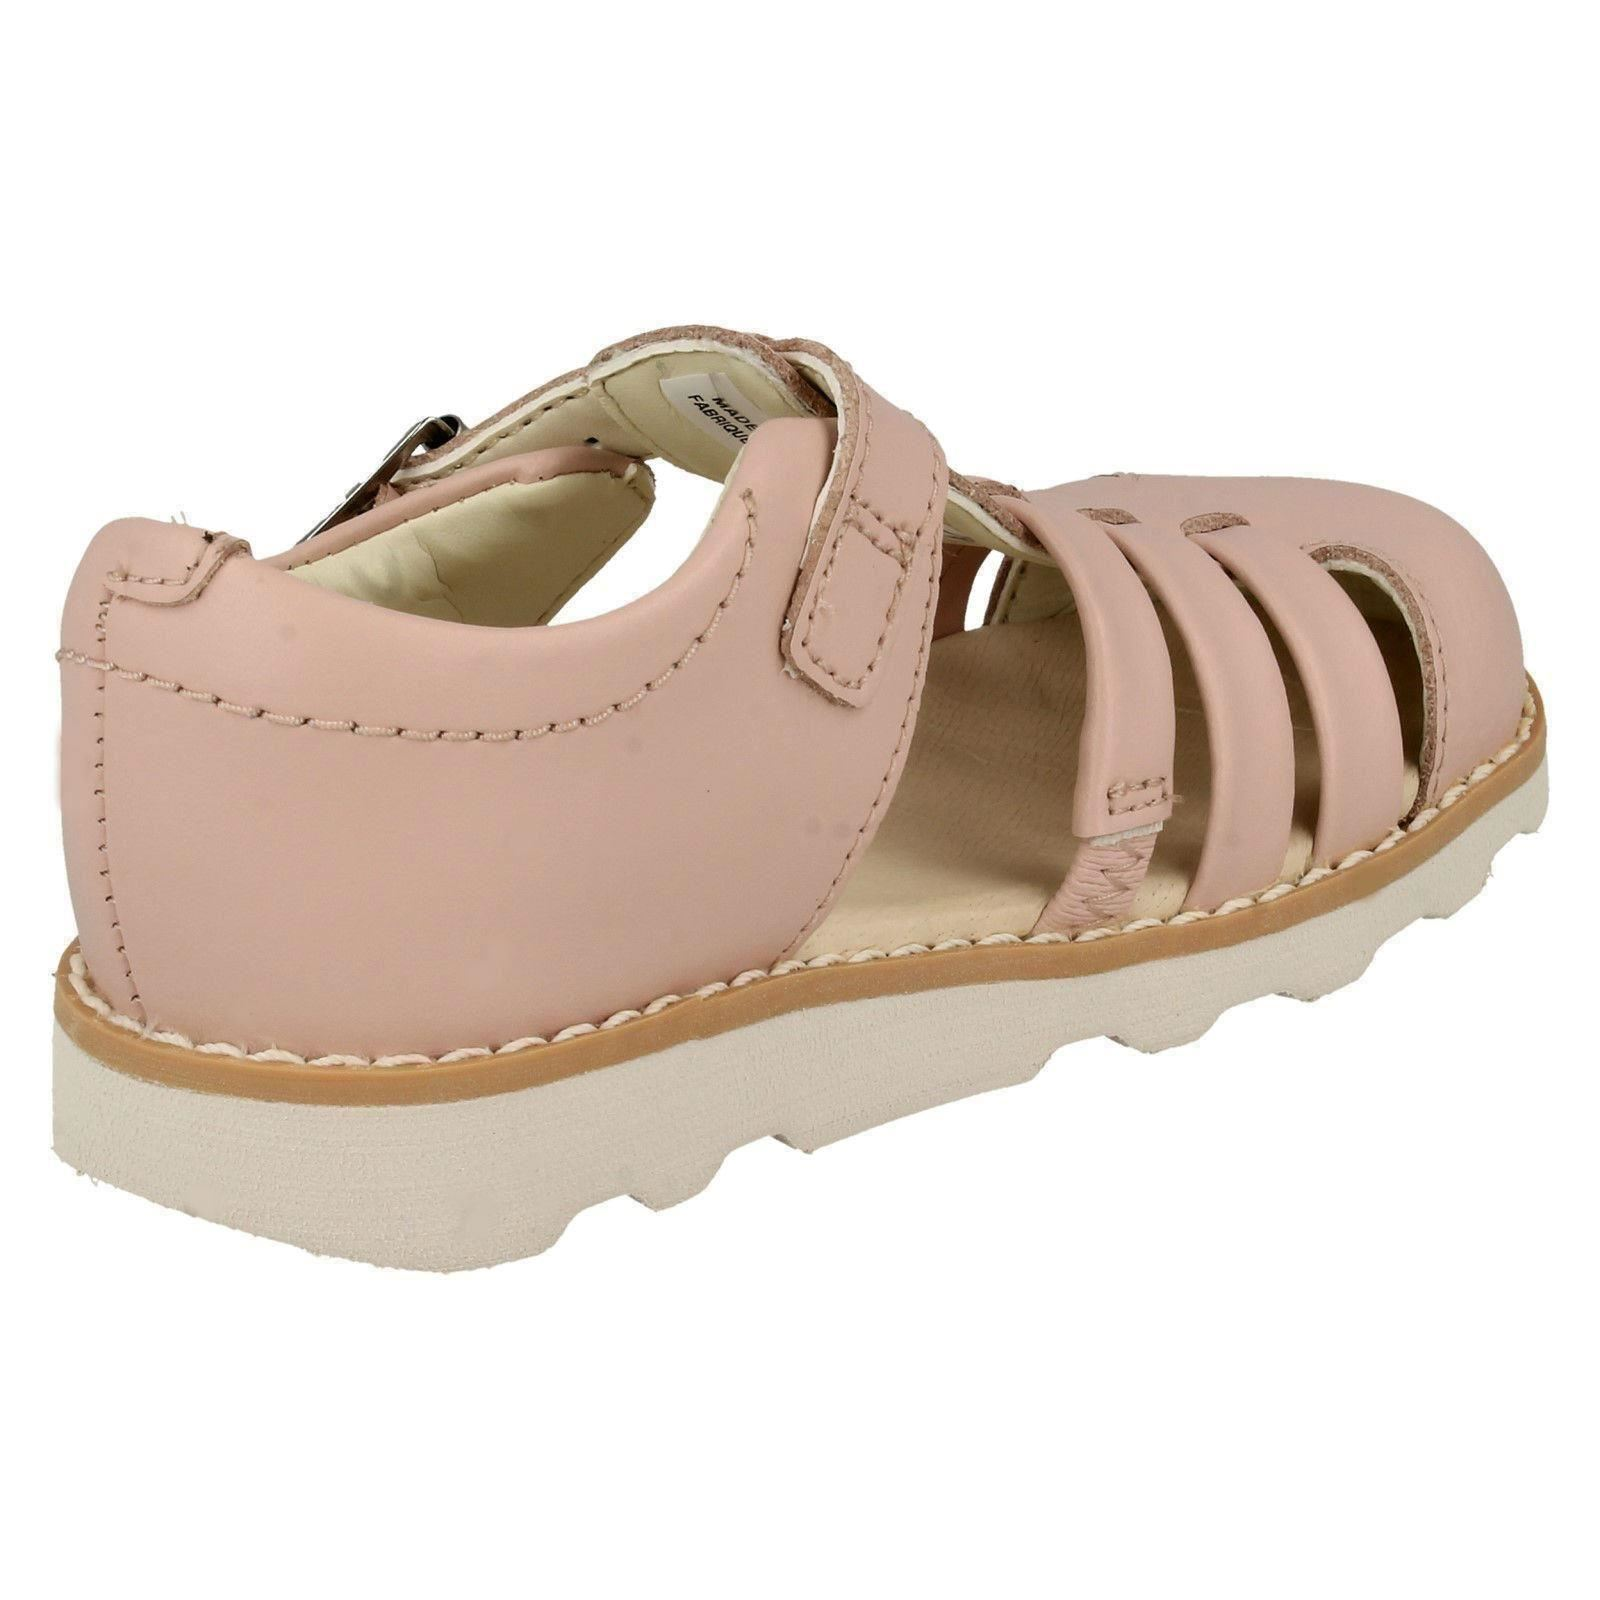 Childrens Boys Girls Clarks Closed Toe Sandals Crown Stem